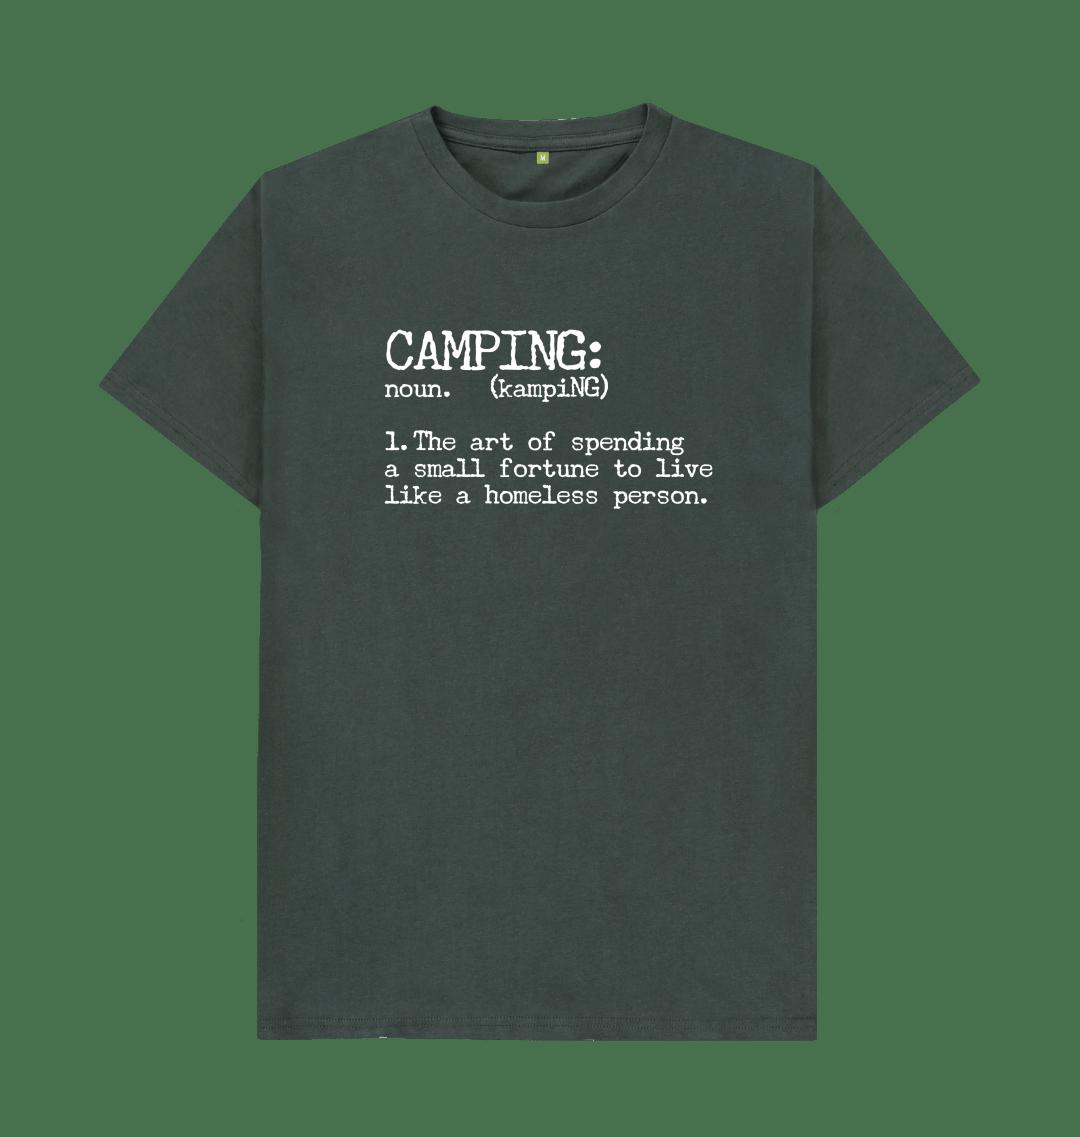 Camping Definition Funny Mens T Shirt Top - Organic Cotton, Vegan dark grey